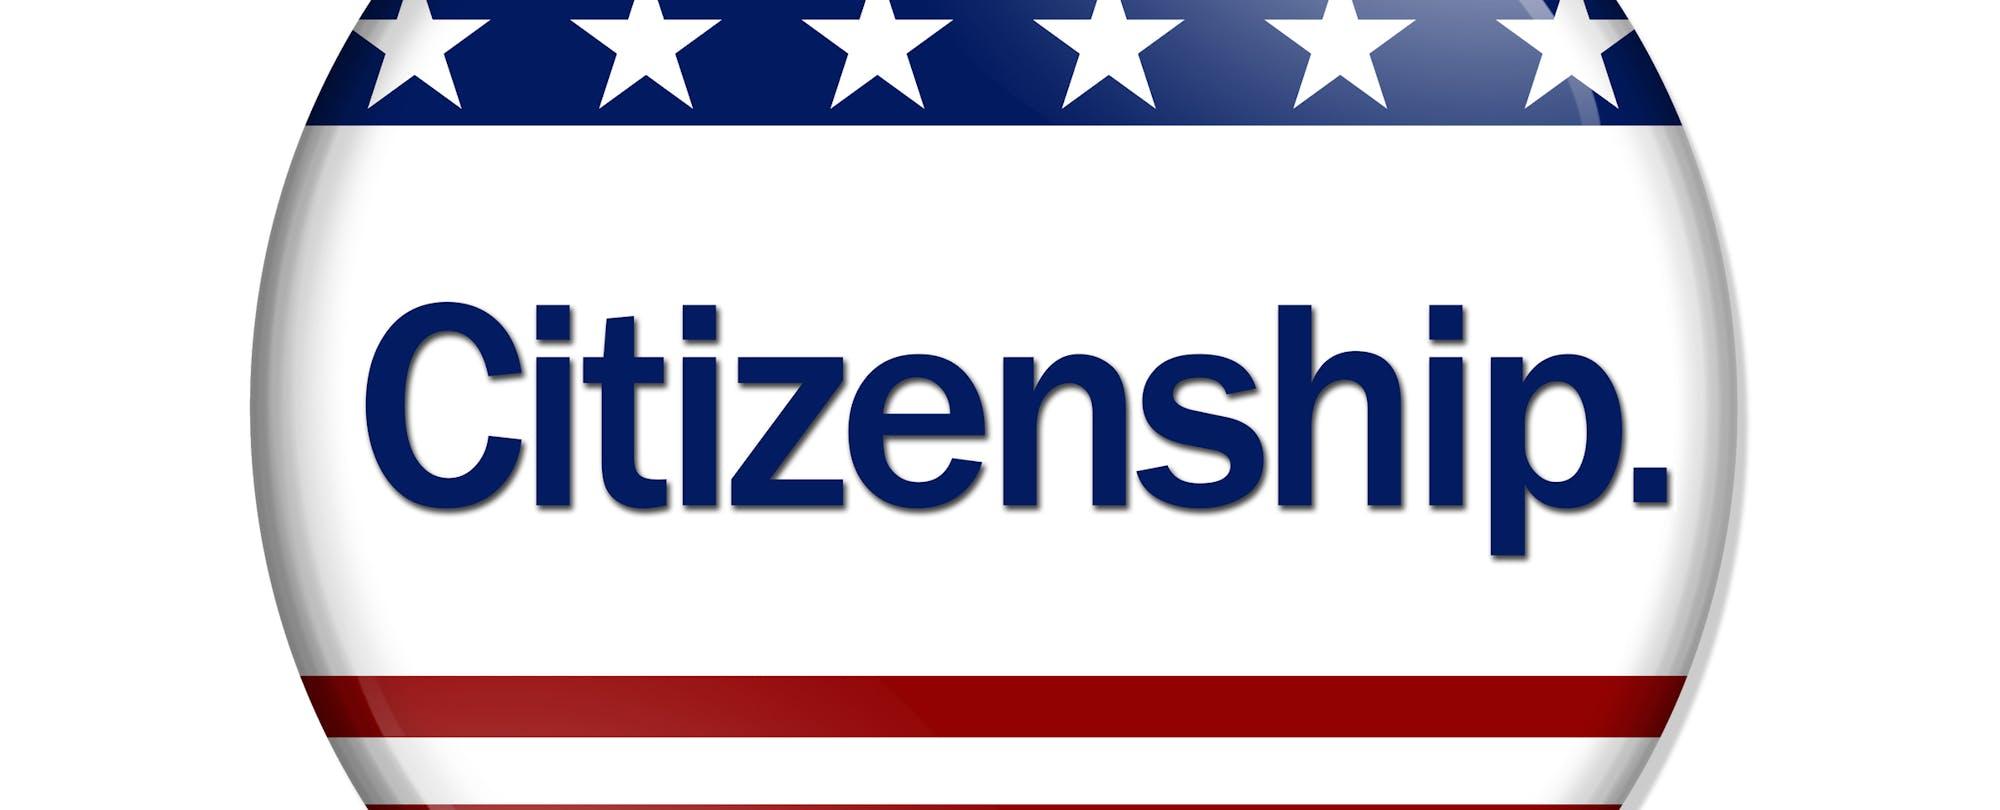 It's Not Digital Citizenship—It's Just Citizenship, Period.